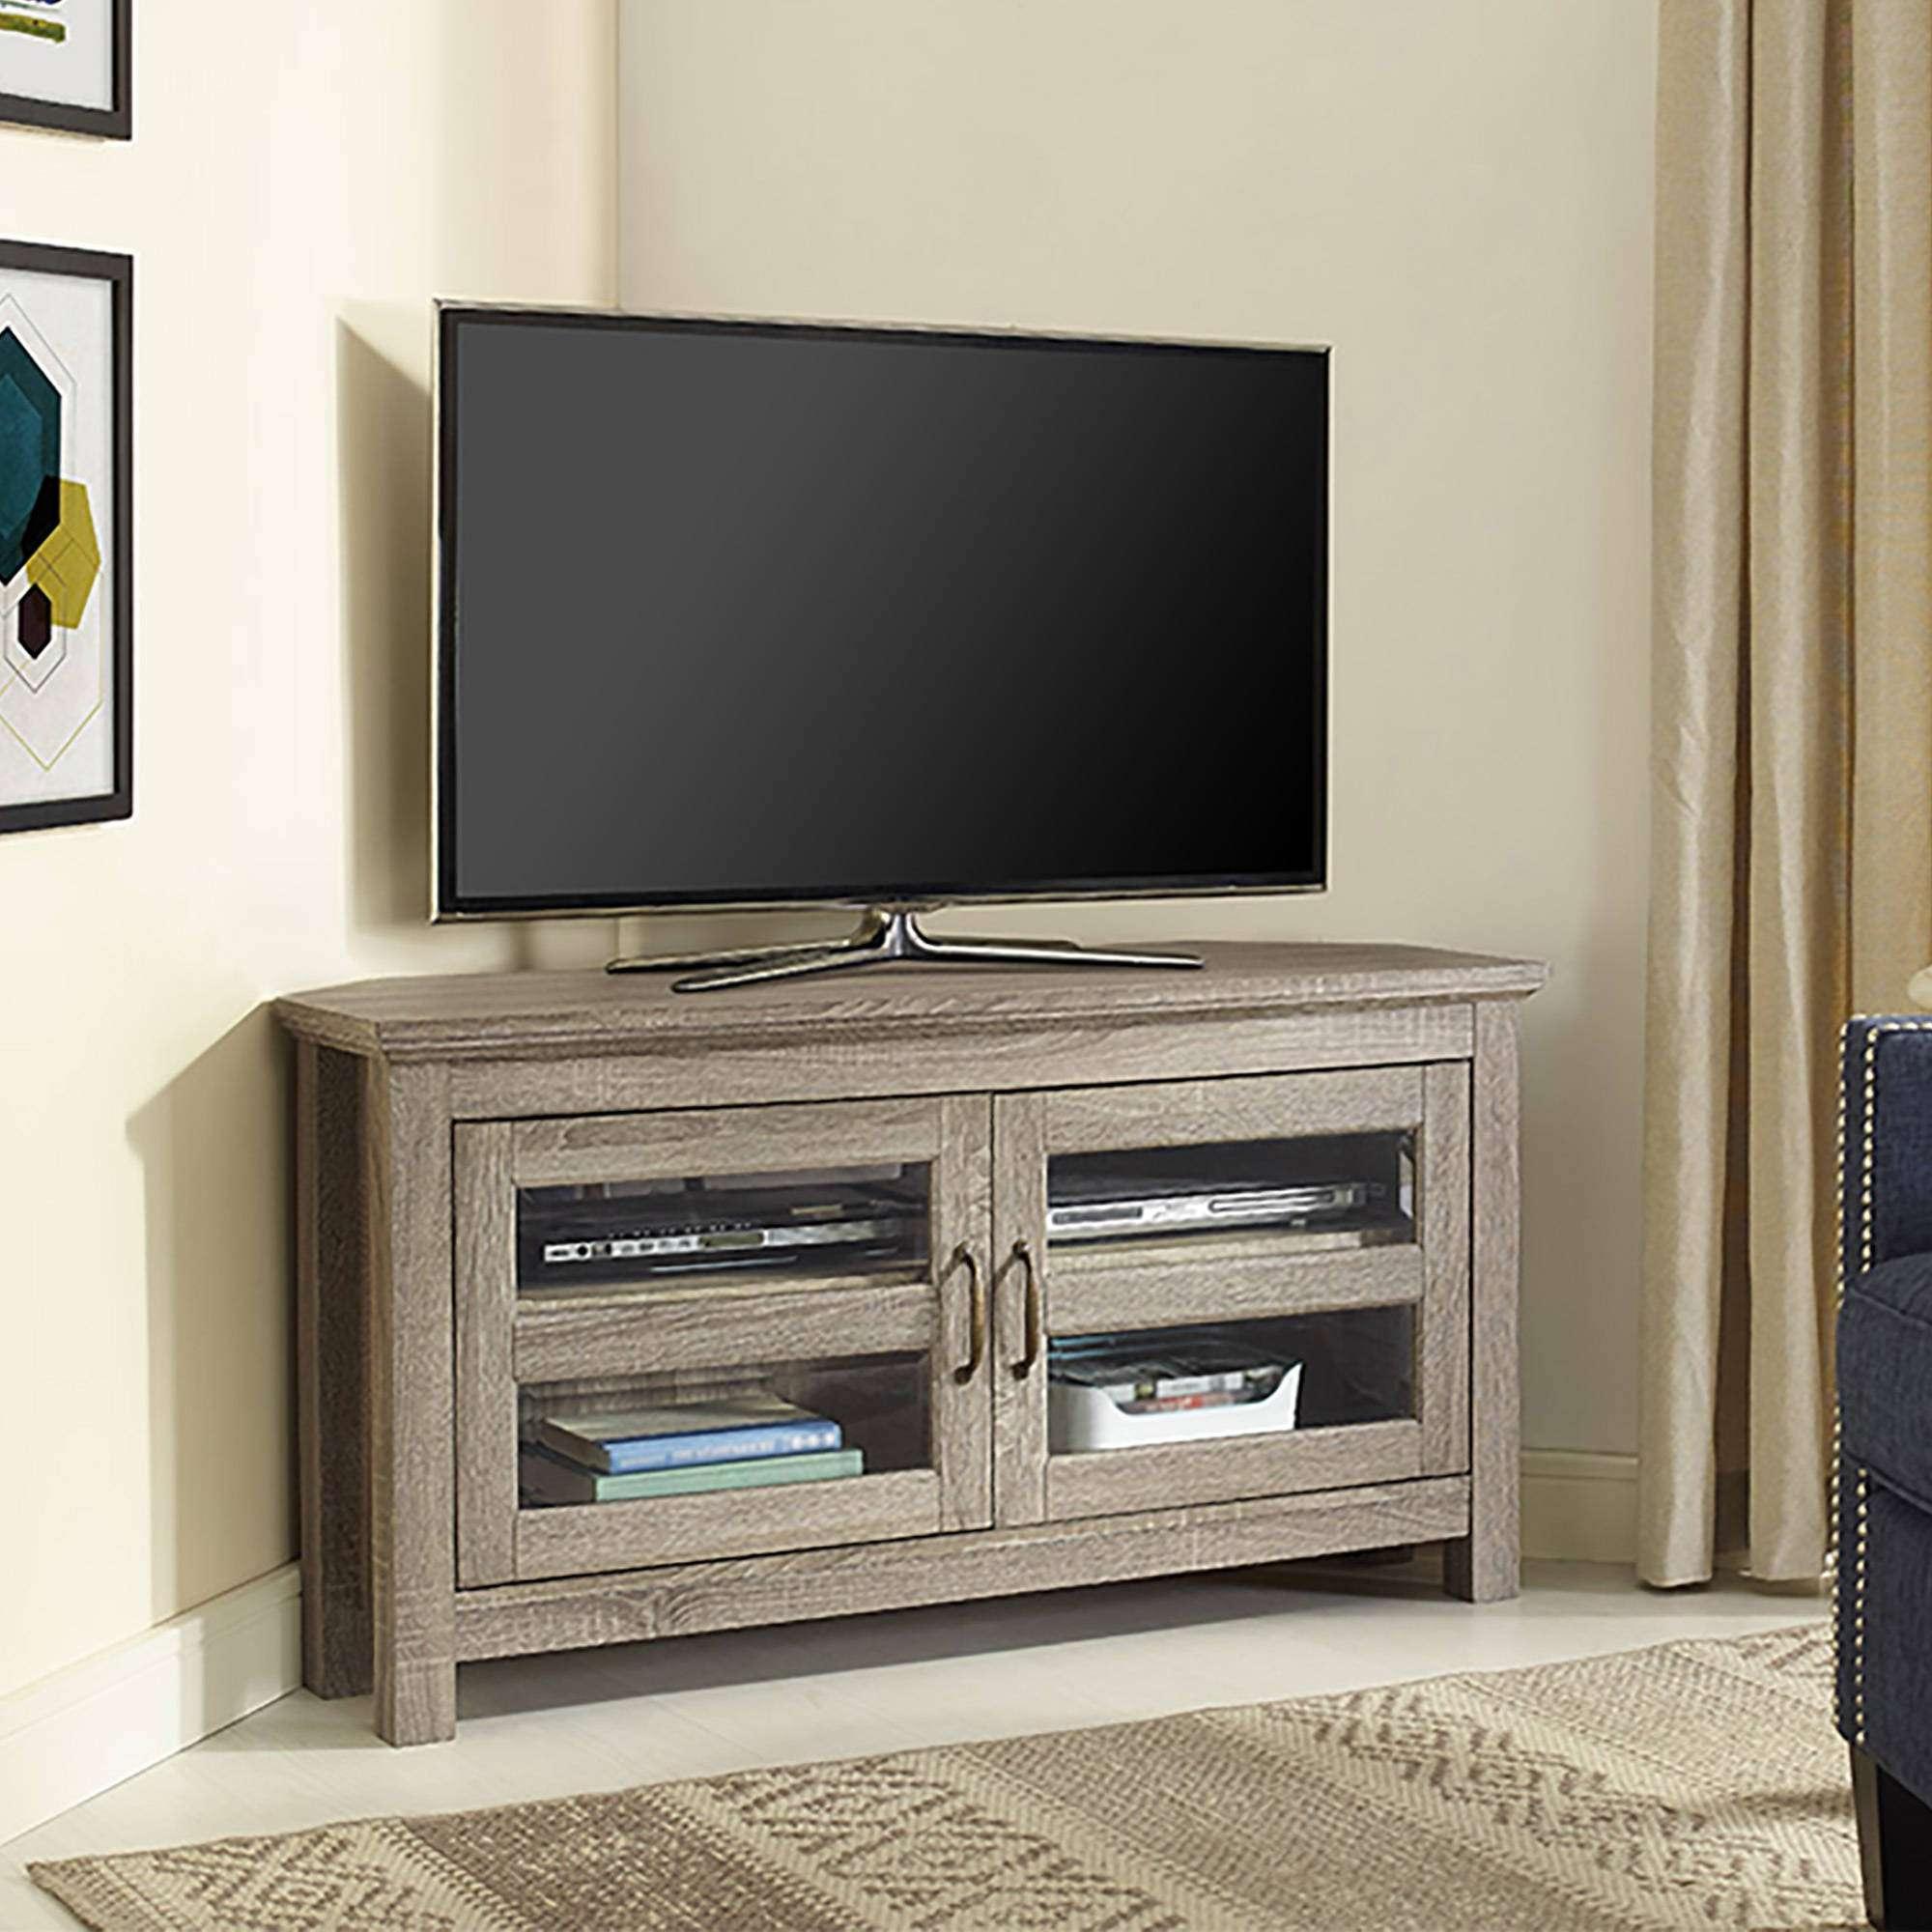 Tv : Gratifying Corner Tv Stands 40 Inch Flat Screen Top 40 Inch With 40 Inch Corner Tv Stands (View 15 of 15)